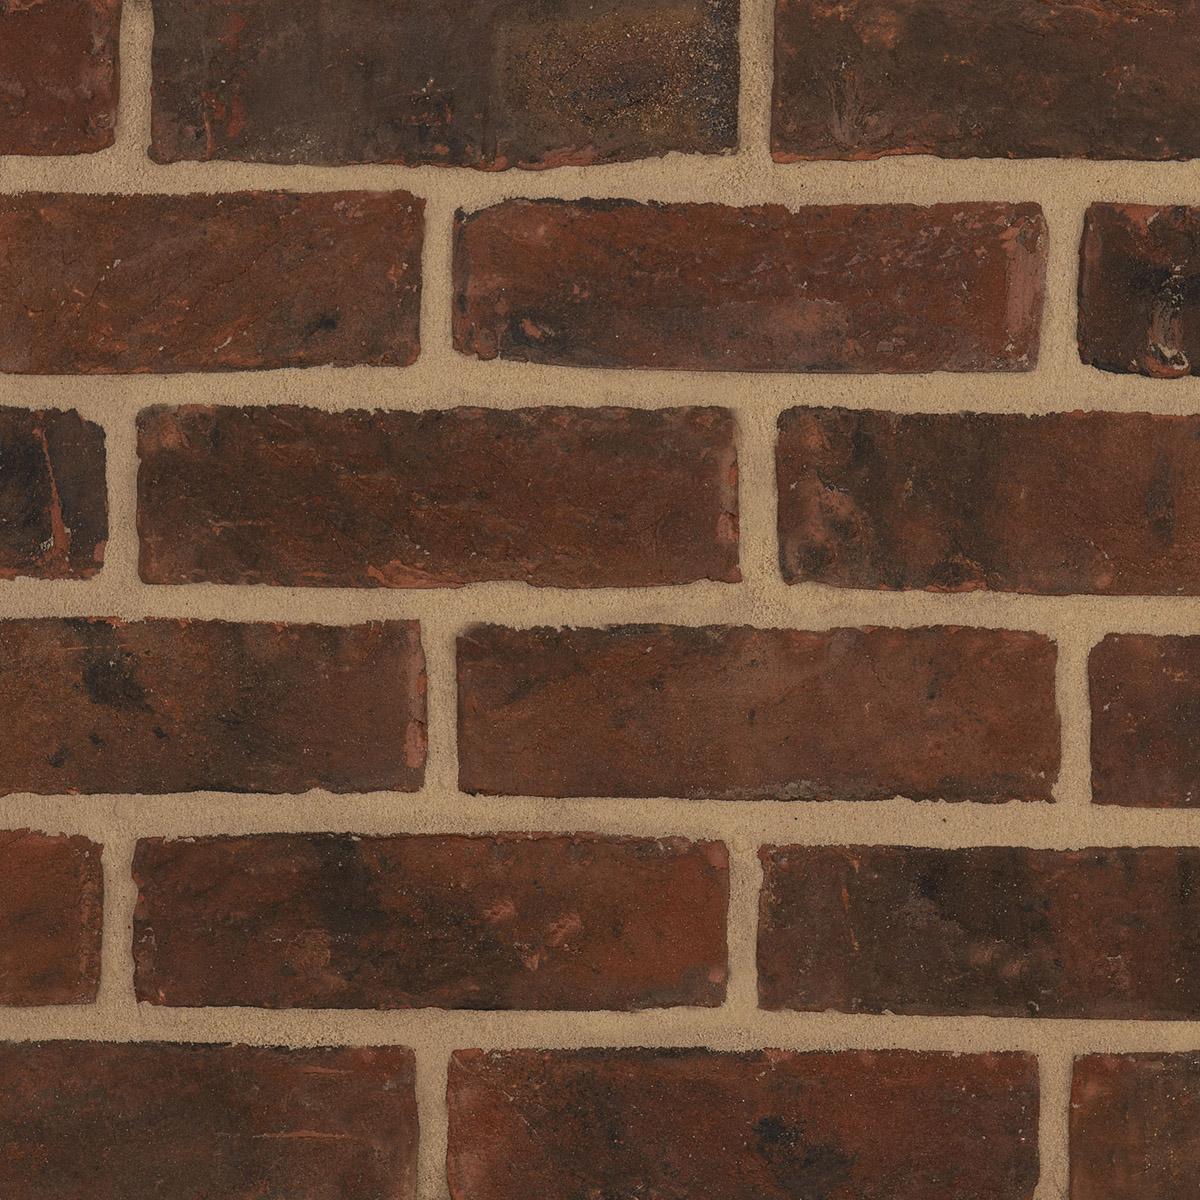 Smoked Red Bricks – Neutral Mortar